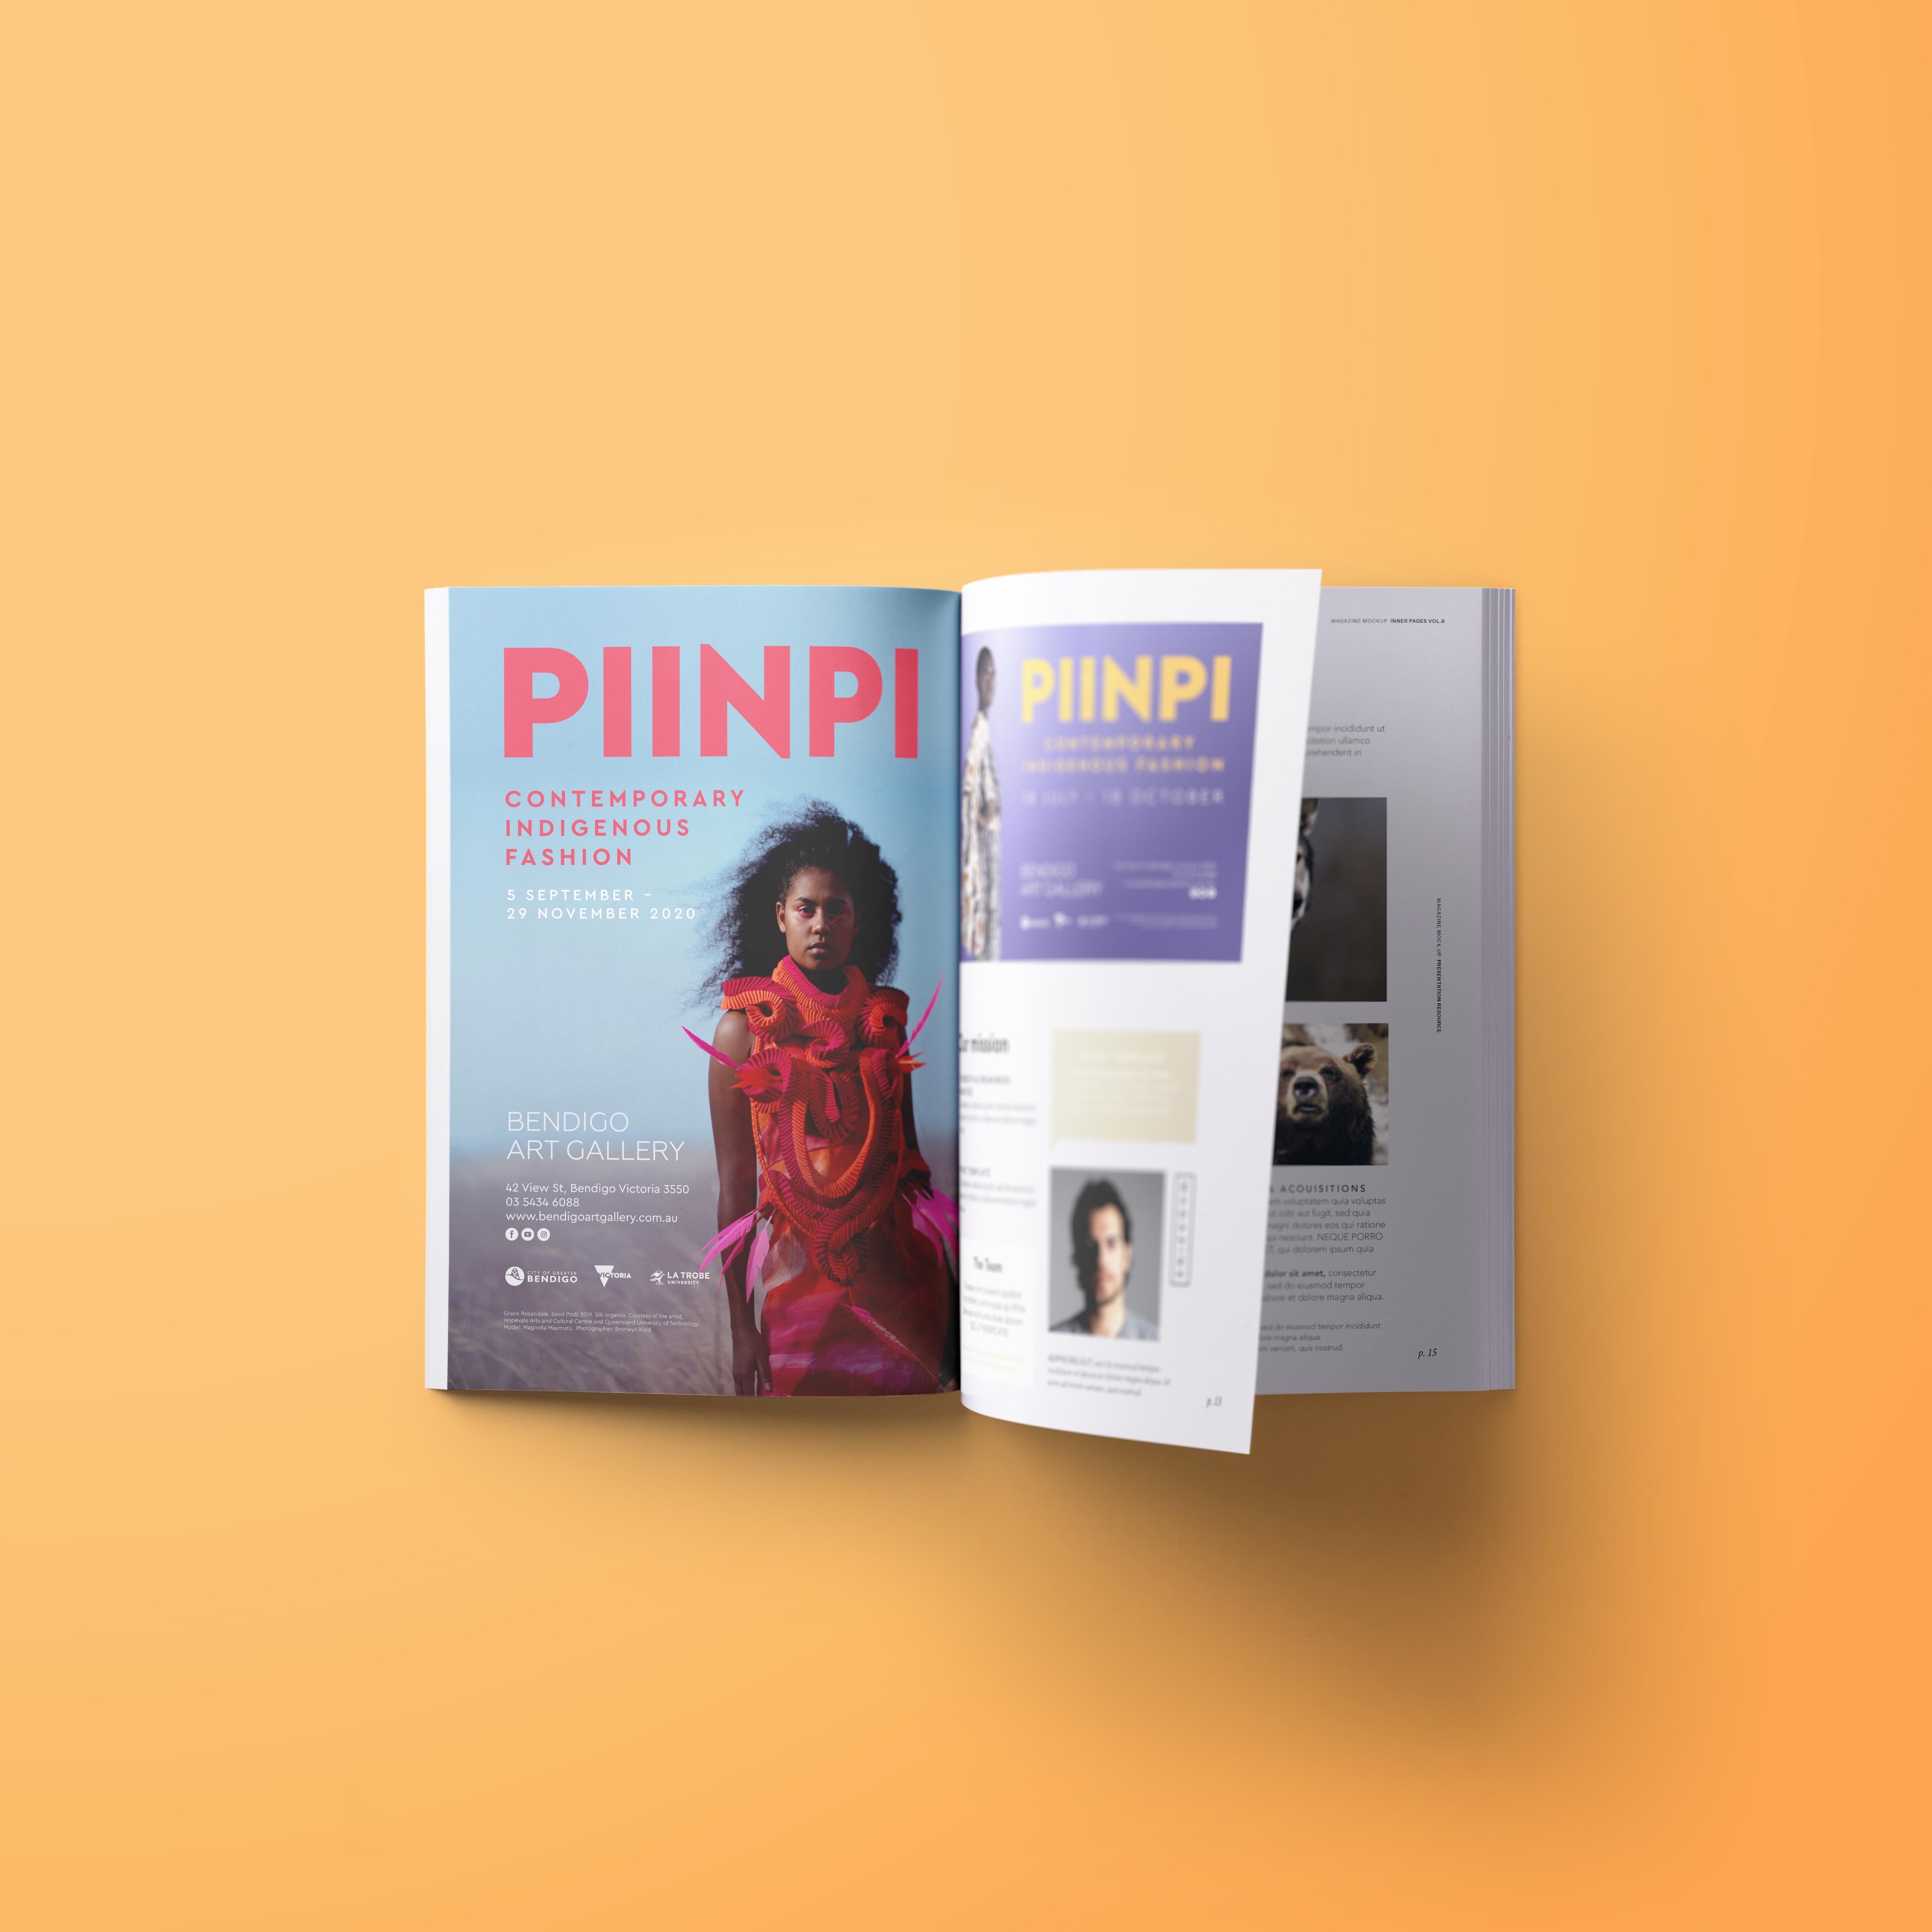 Piinpi advertising